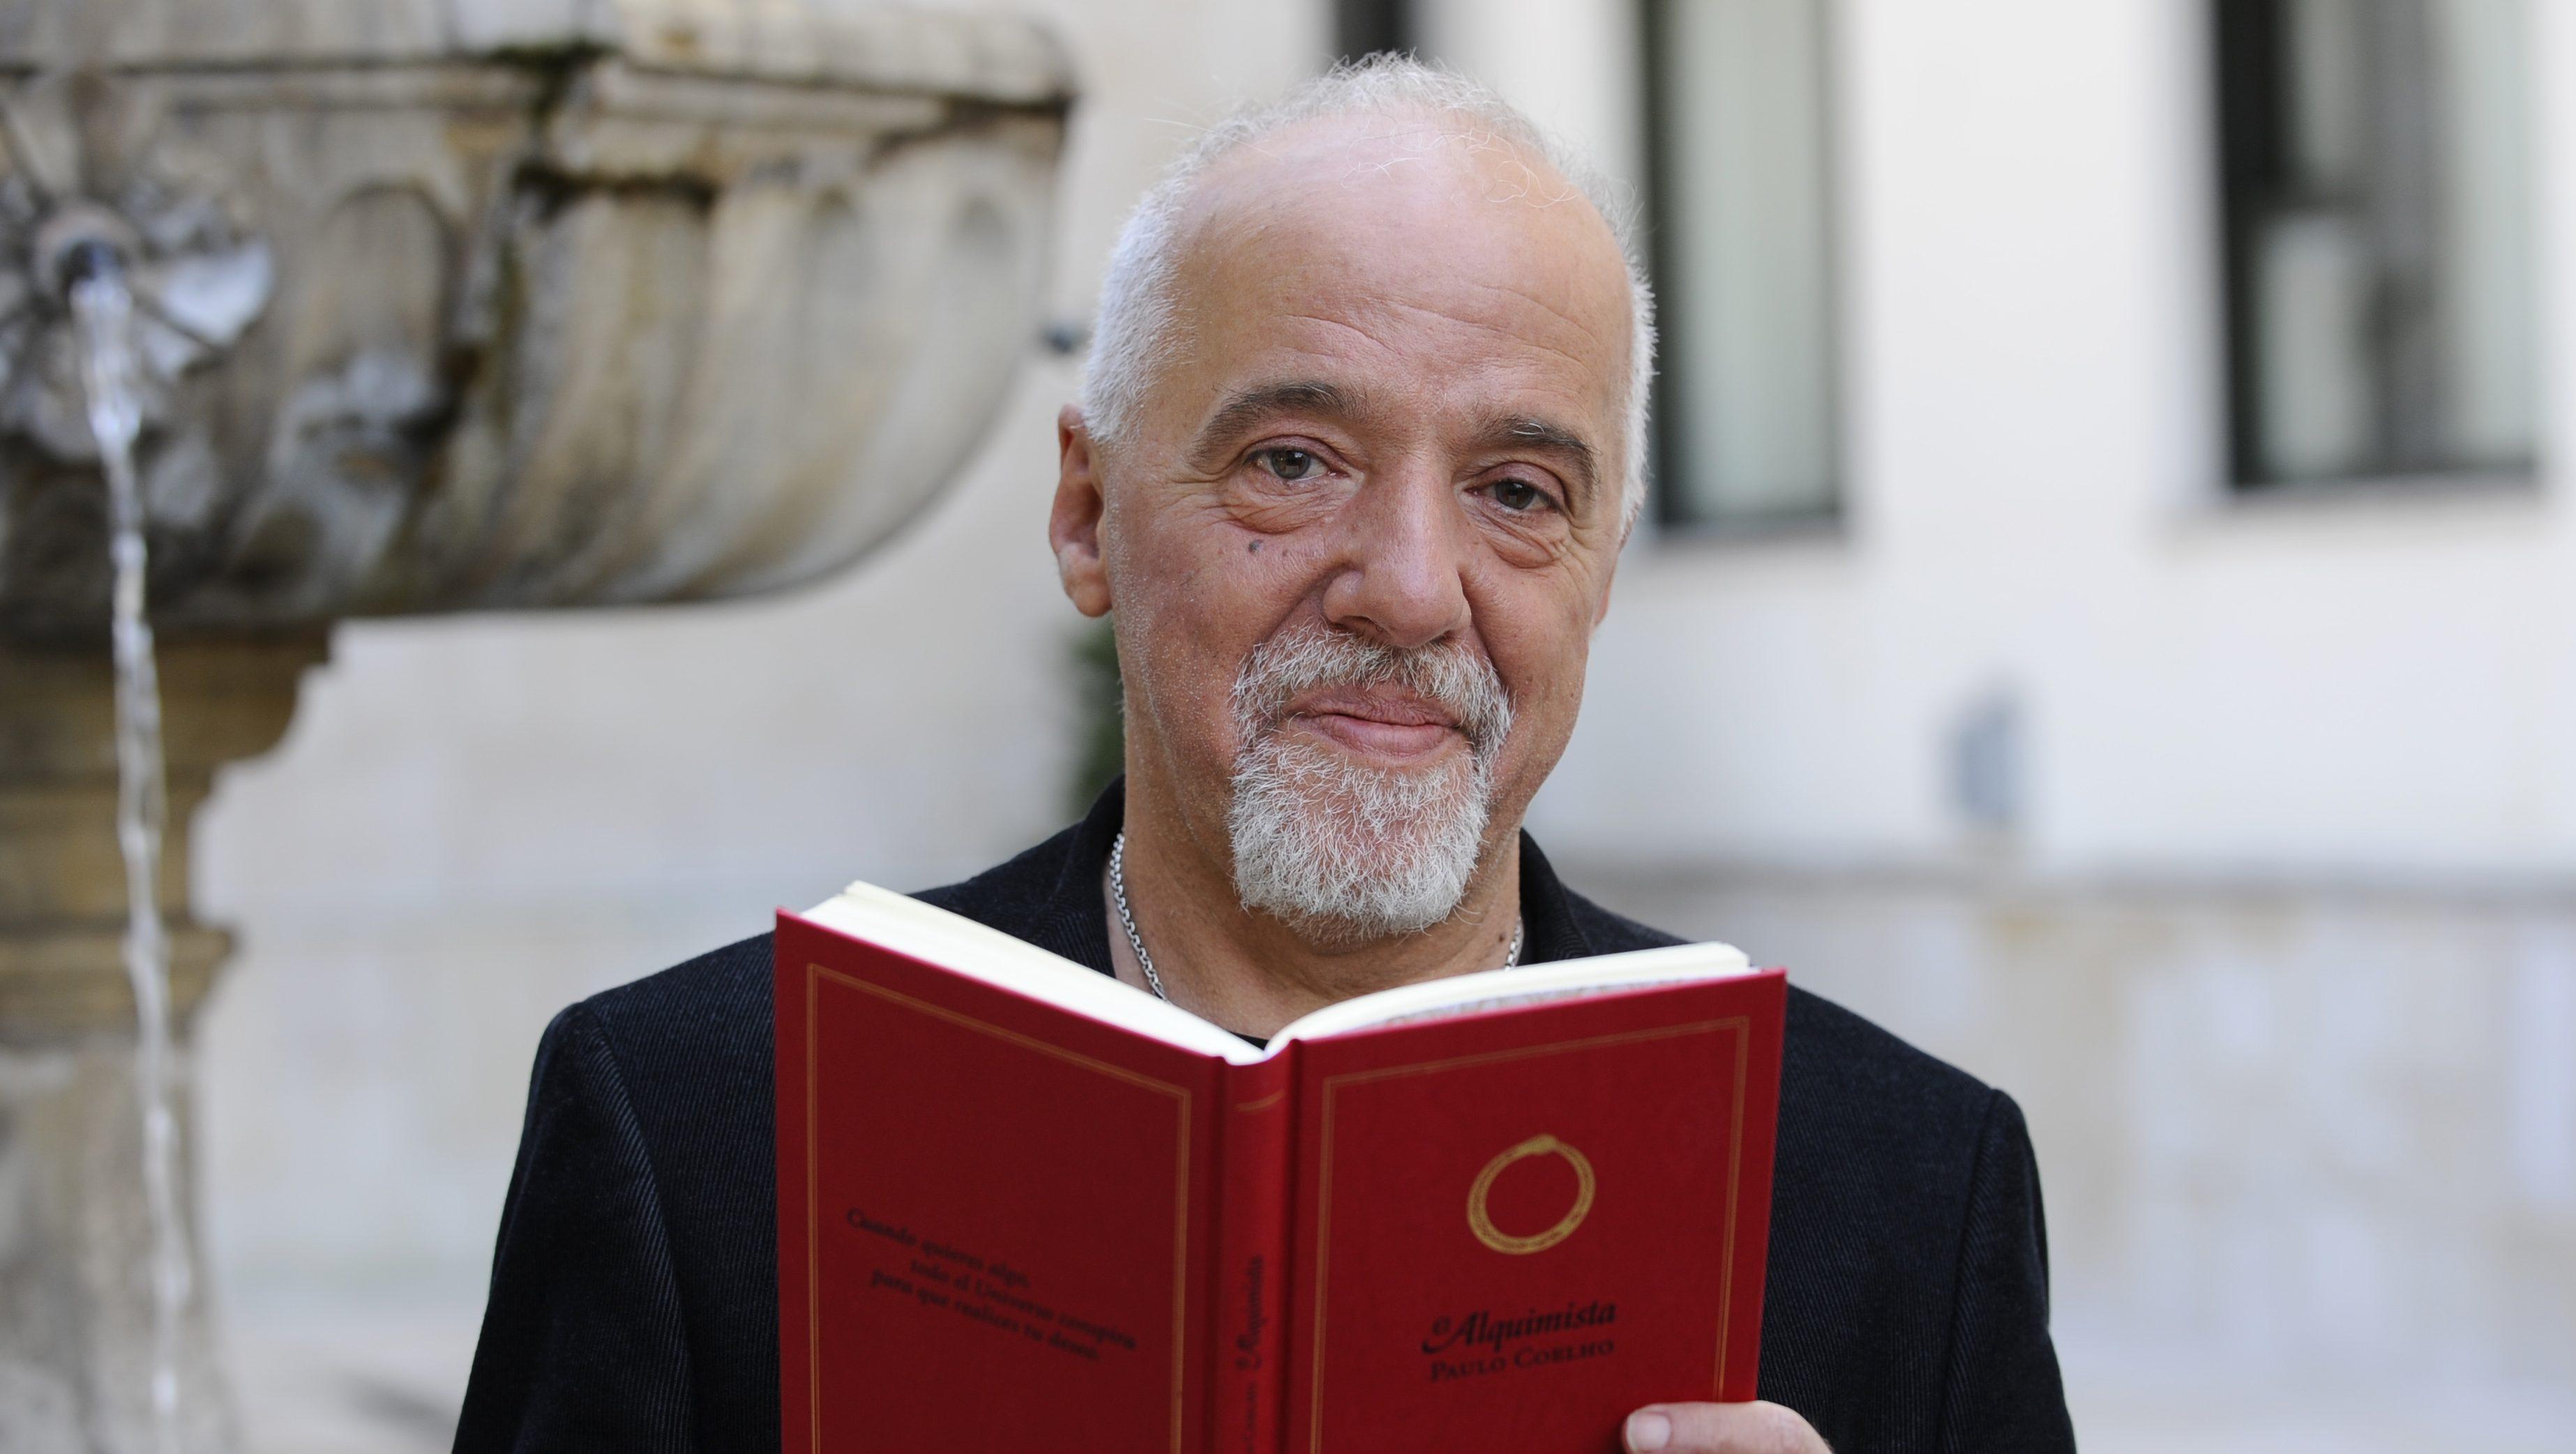 The Alchemist's Paulo Coelho to give free books to Africa schools — Quartz  Africa